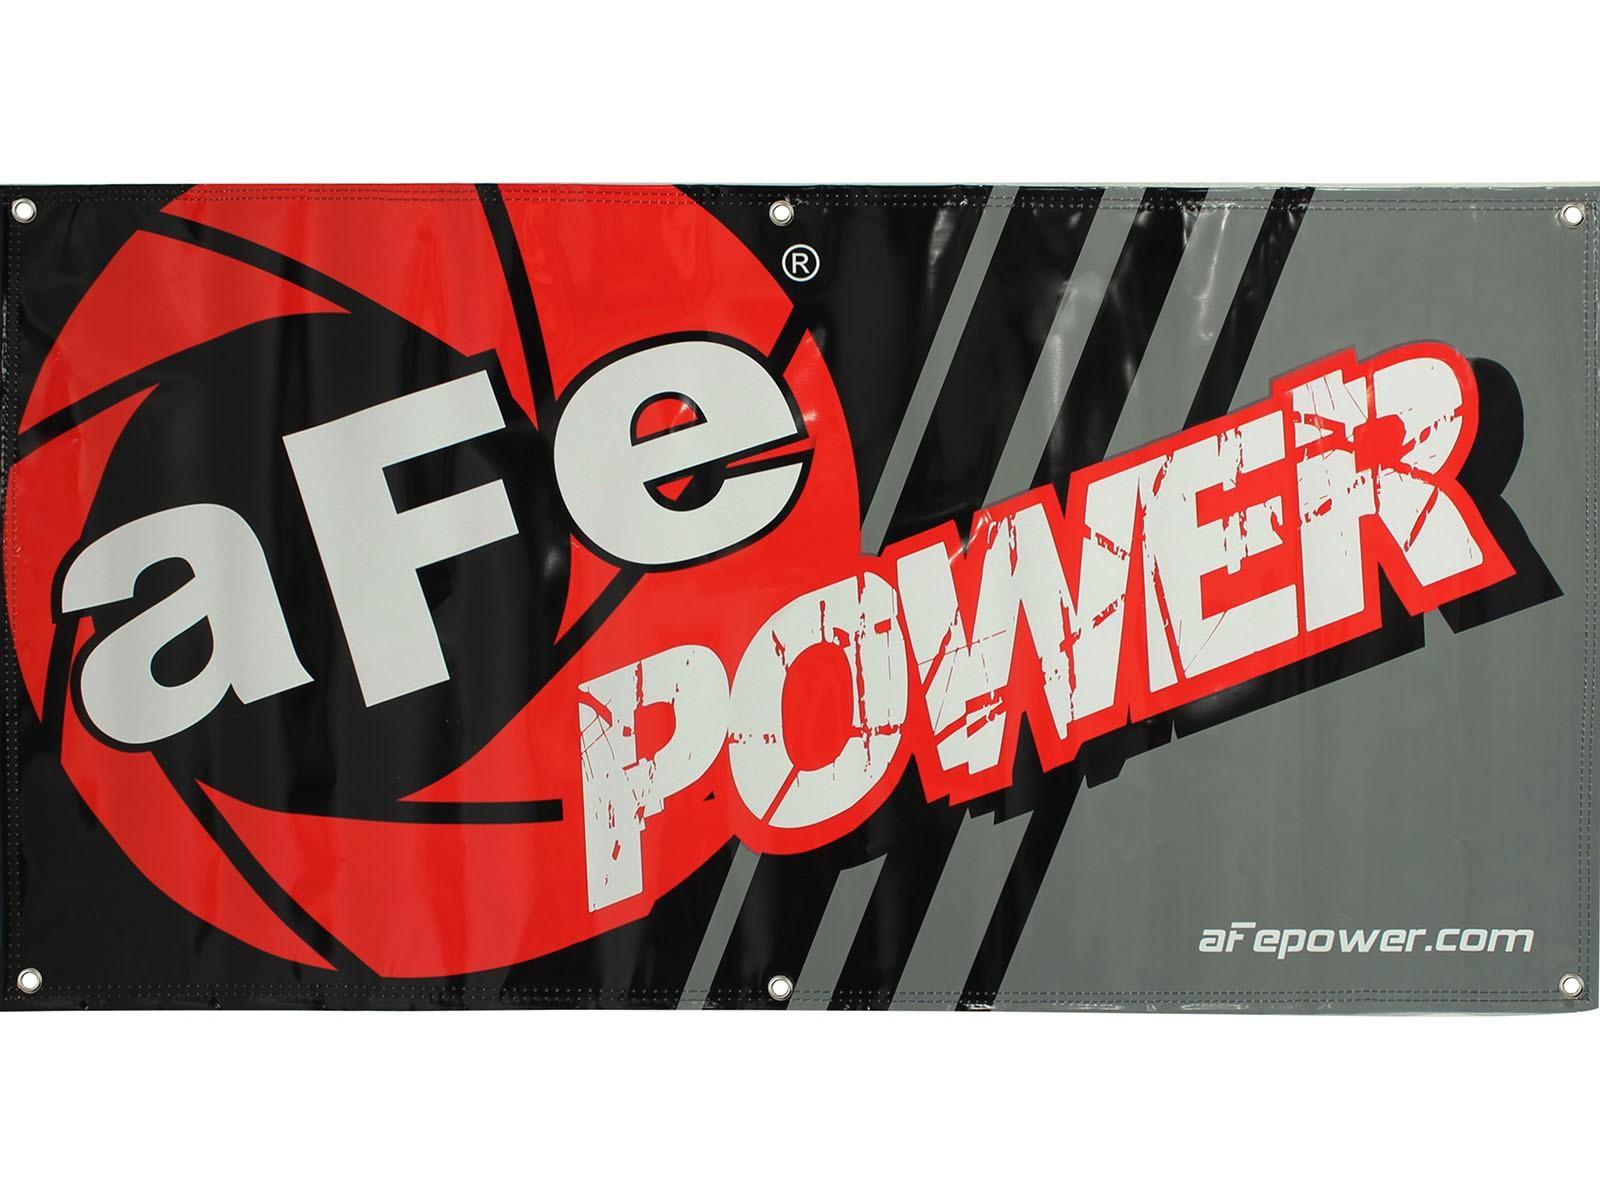 aFe POWER 40-10039 Banner, 2' x 4' ft.; aFe Power